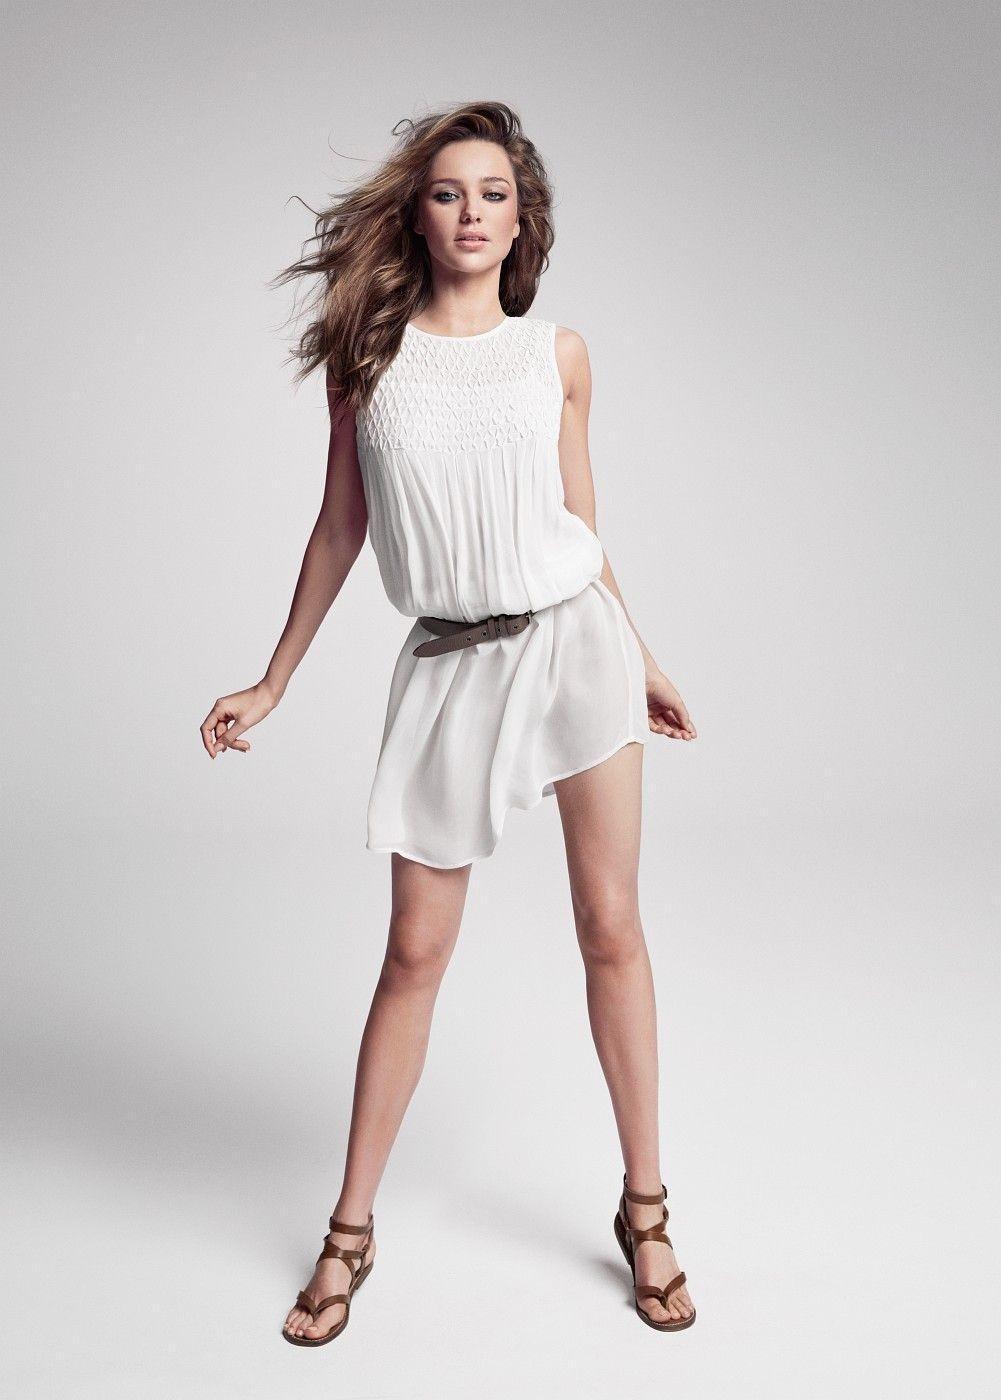 brunettes Miranda Kerr fashion photo shoot white wall ...